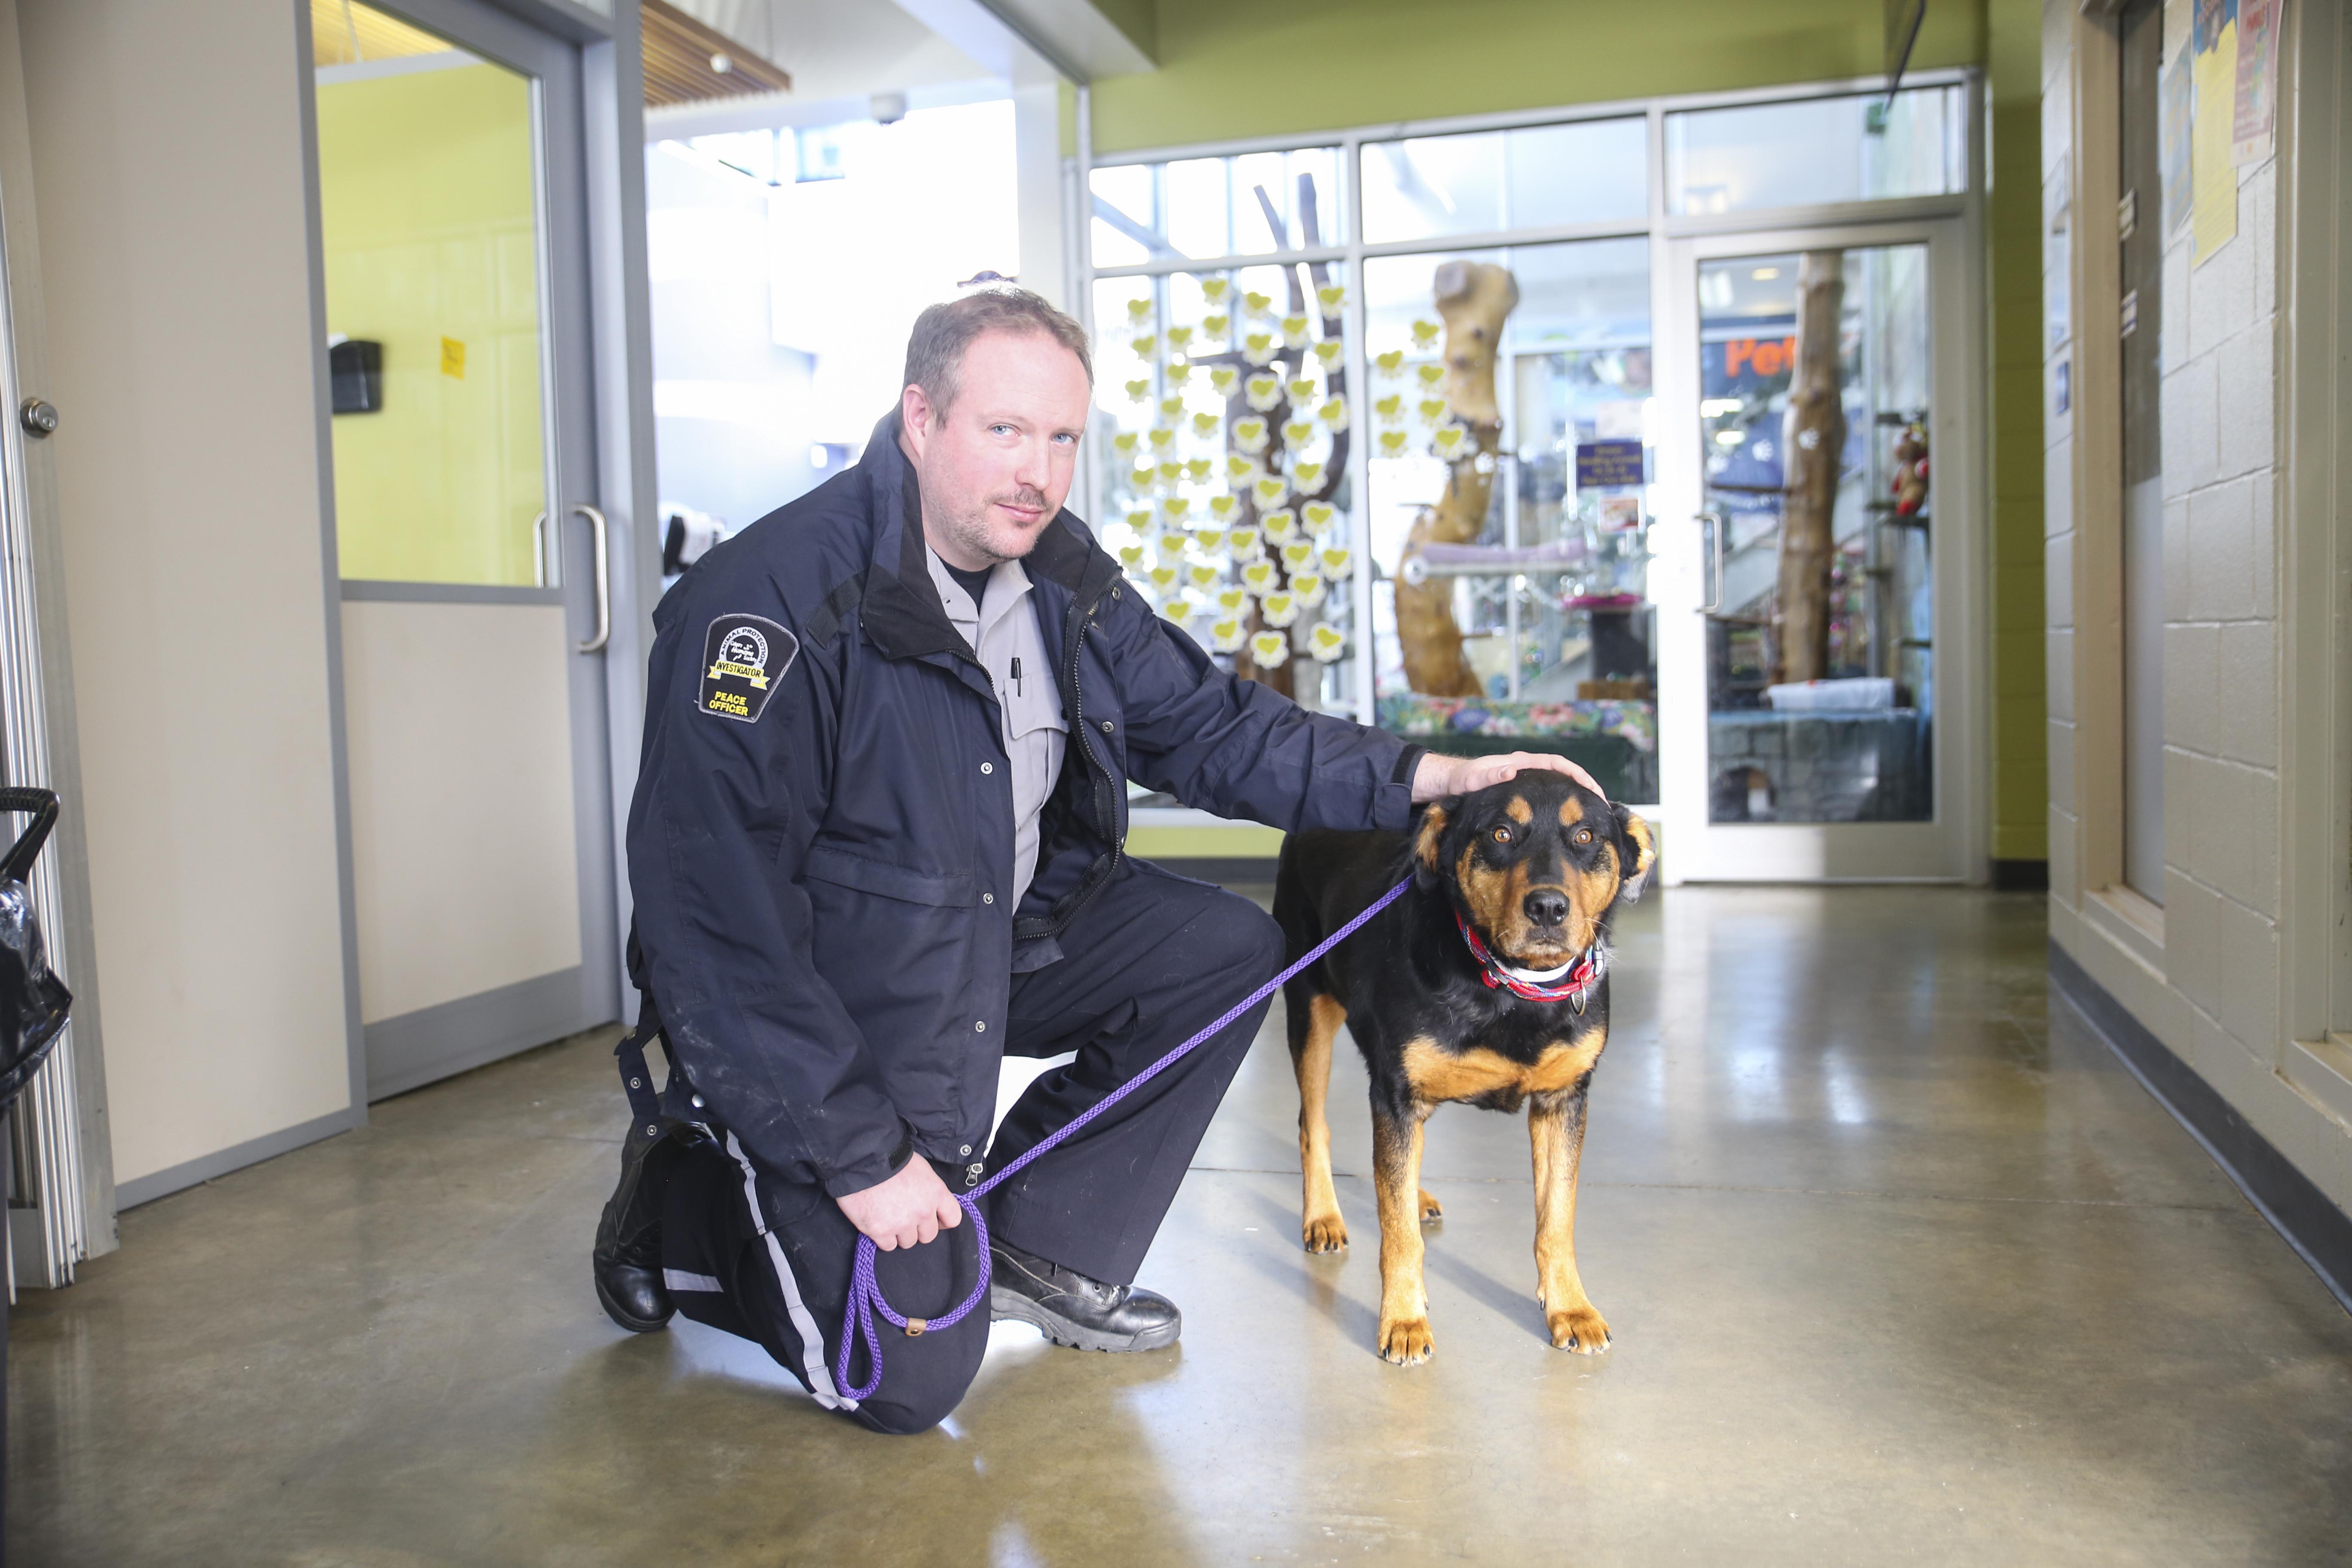 Calgary Humane Society 'run off its feet' as animals are